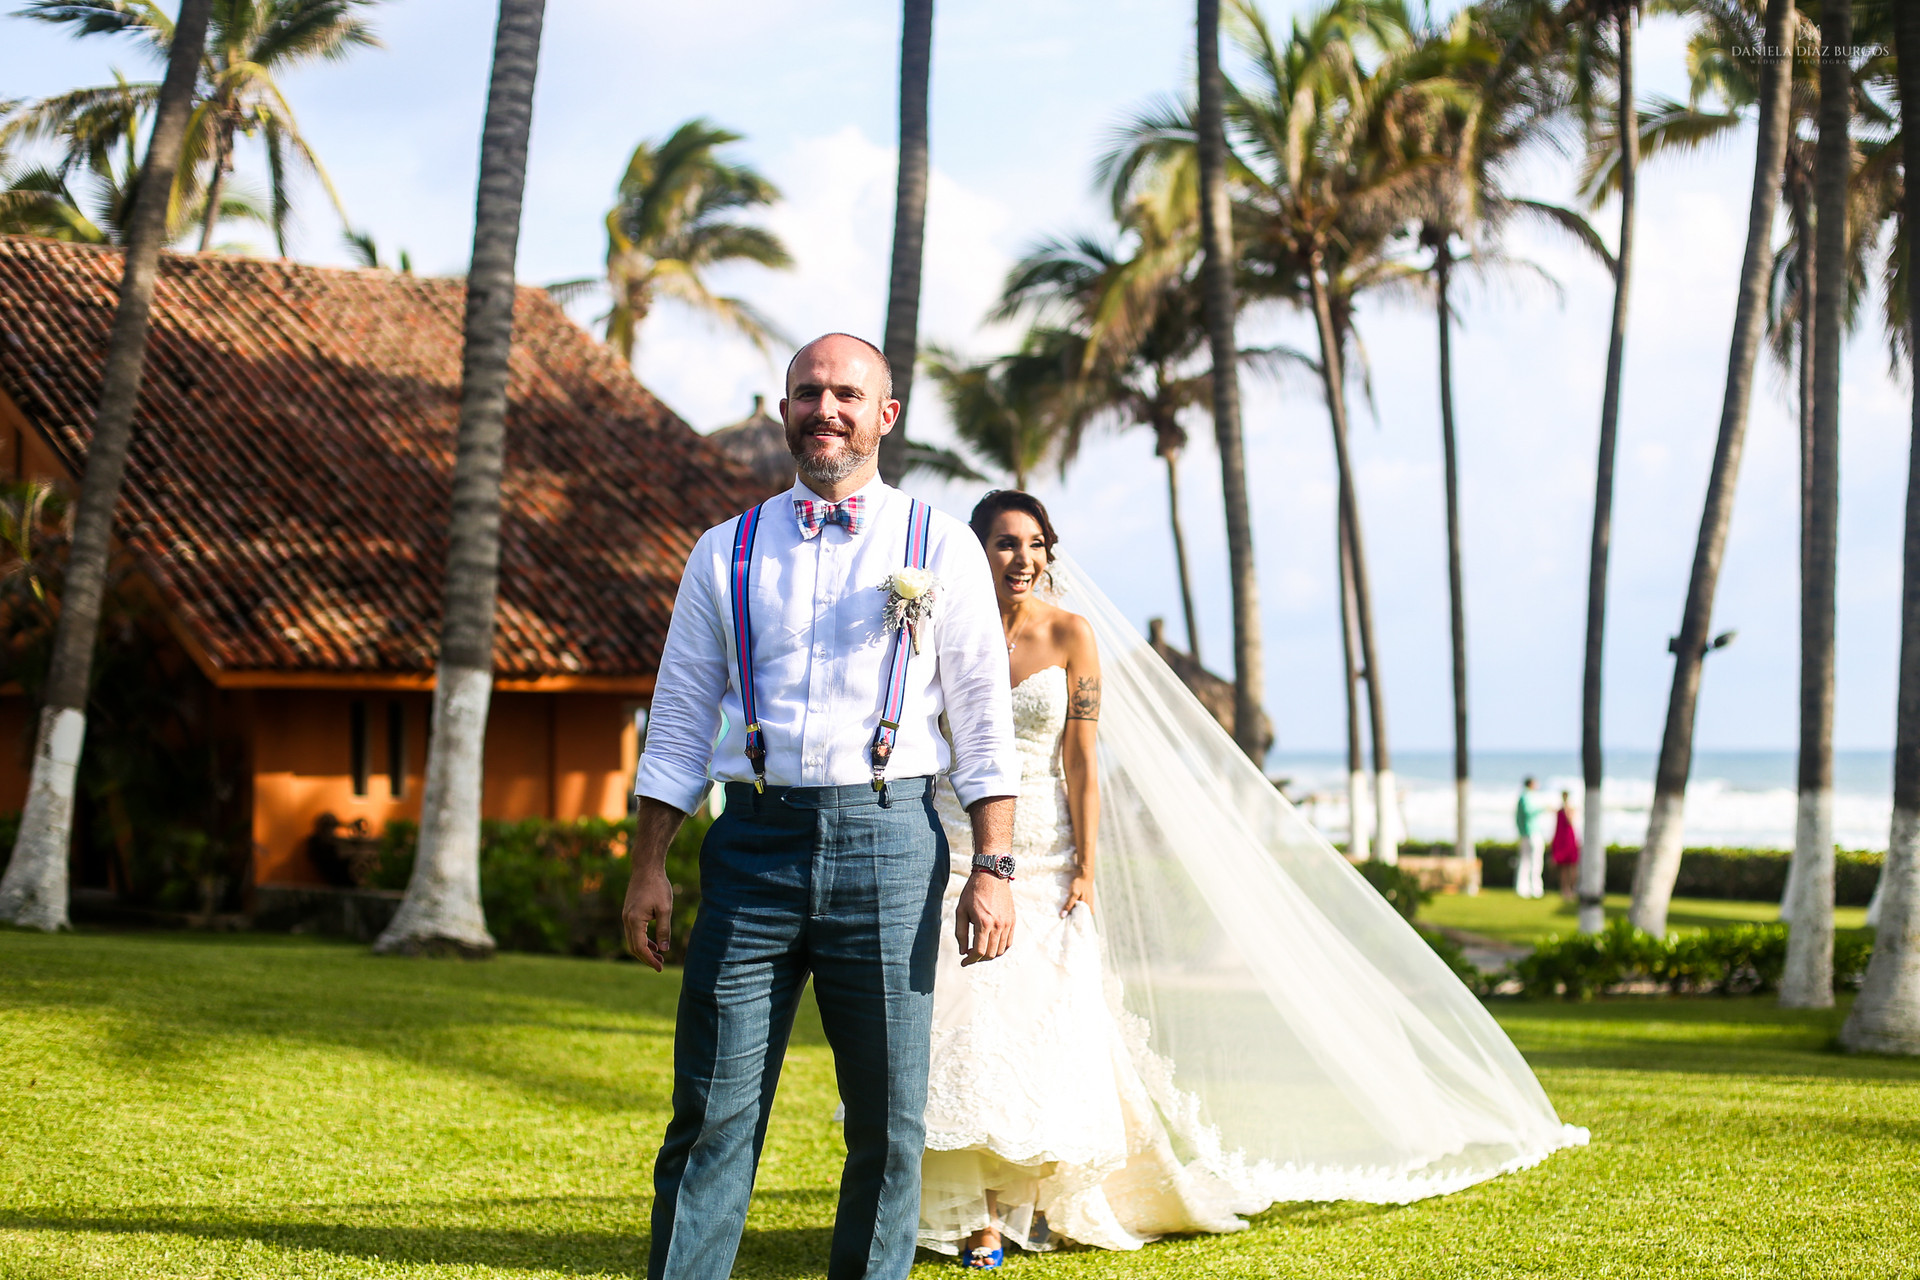 AnaC+Javier-Wedding-LD-343.jpg